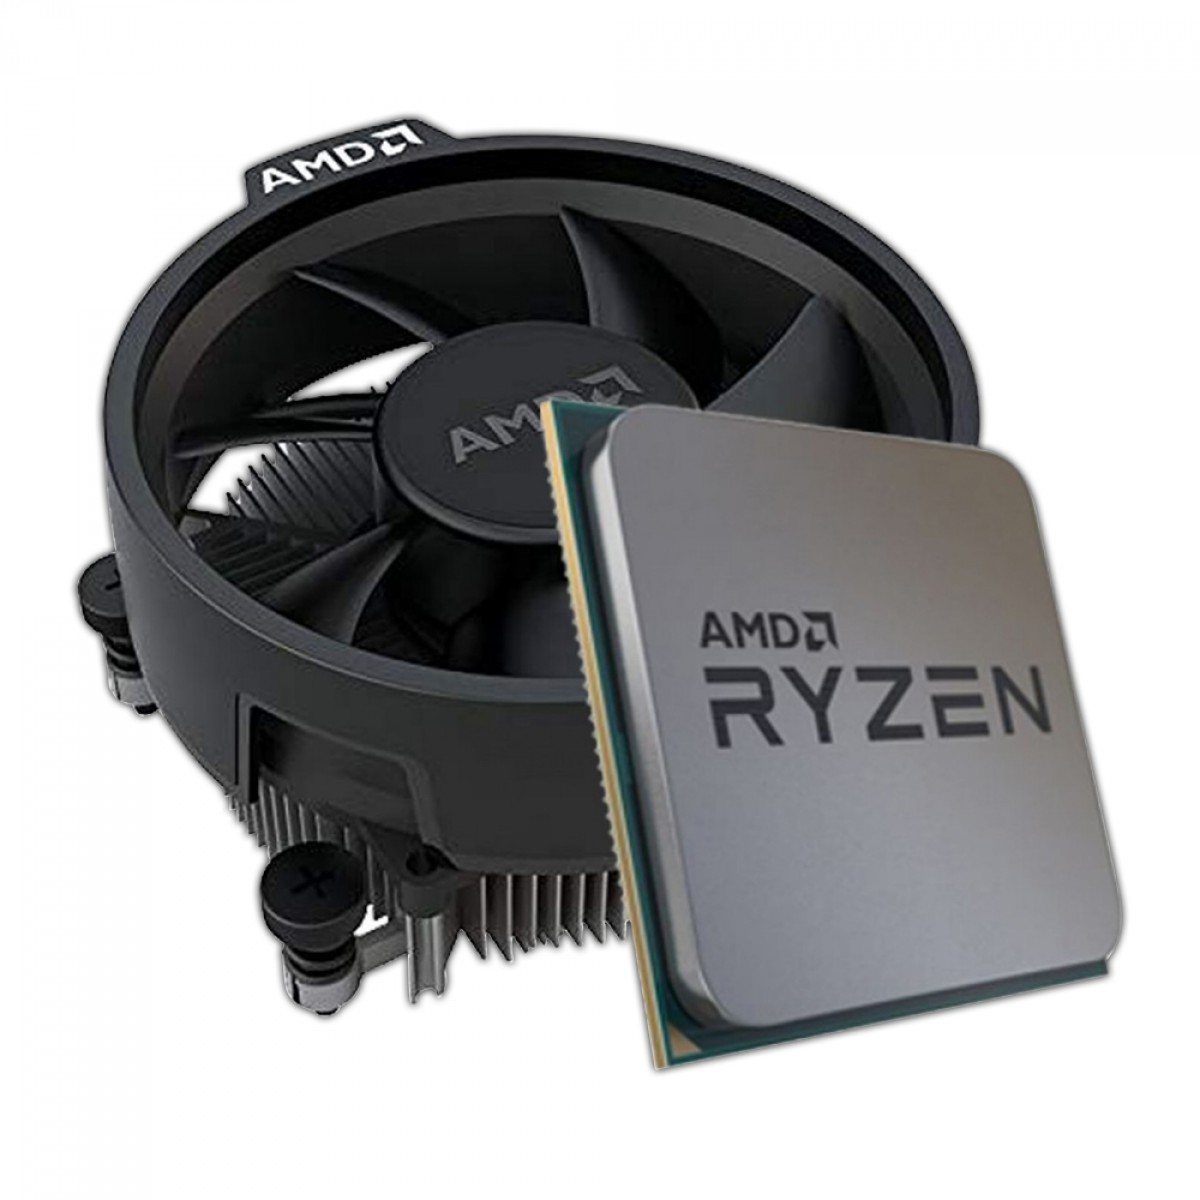 Kit Upgrade, AMD Ryzen 5 3400G, Colorful AB350M-K PRO V14, Memória DDR4 16GB (2x8GB) 3000MHz